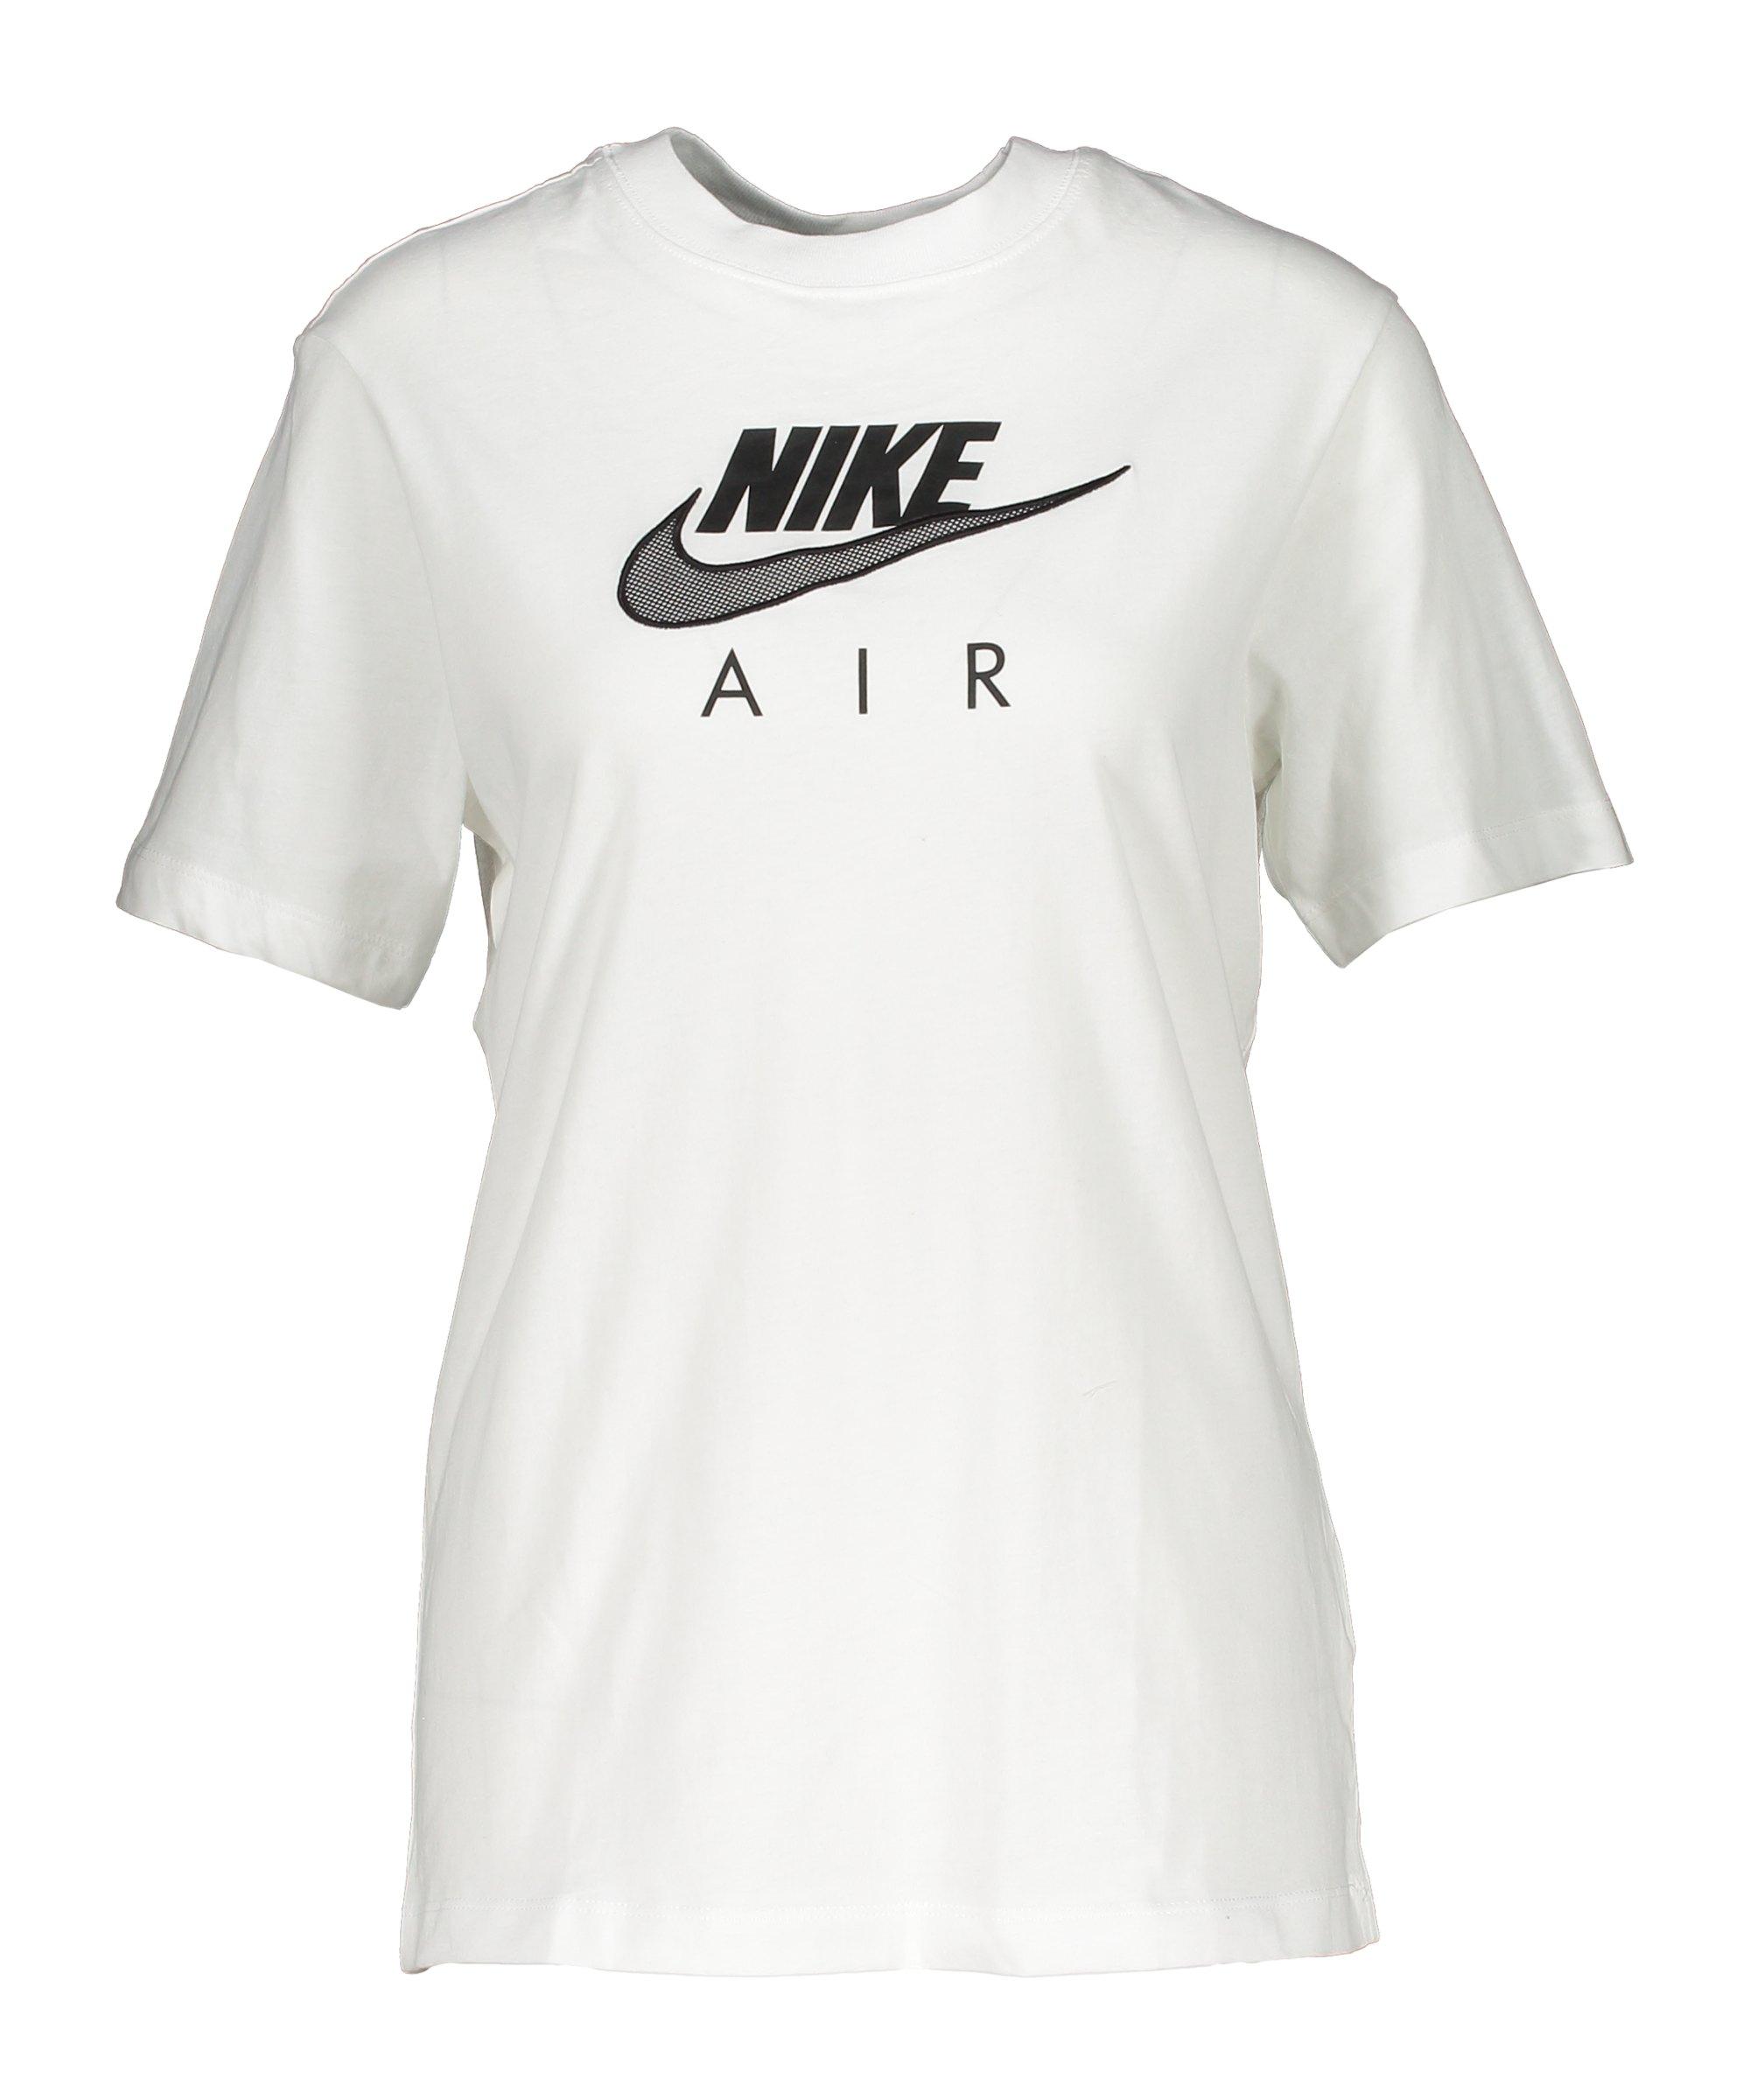 Nike Air Boyfriend Top Damen Weiss Schwarz F100 - weiss